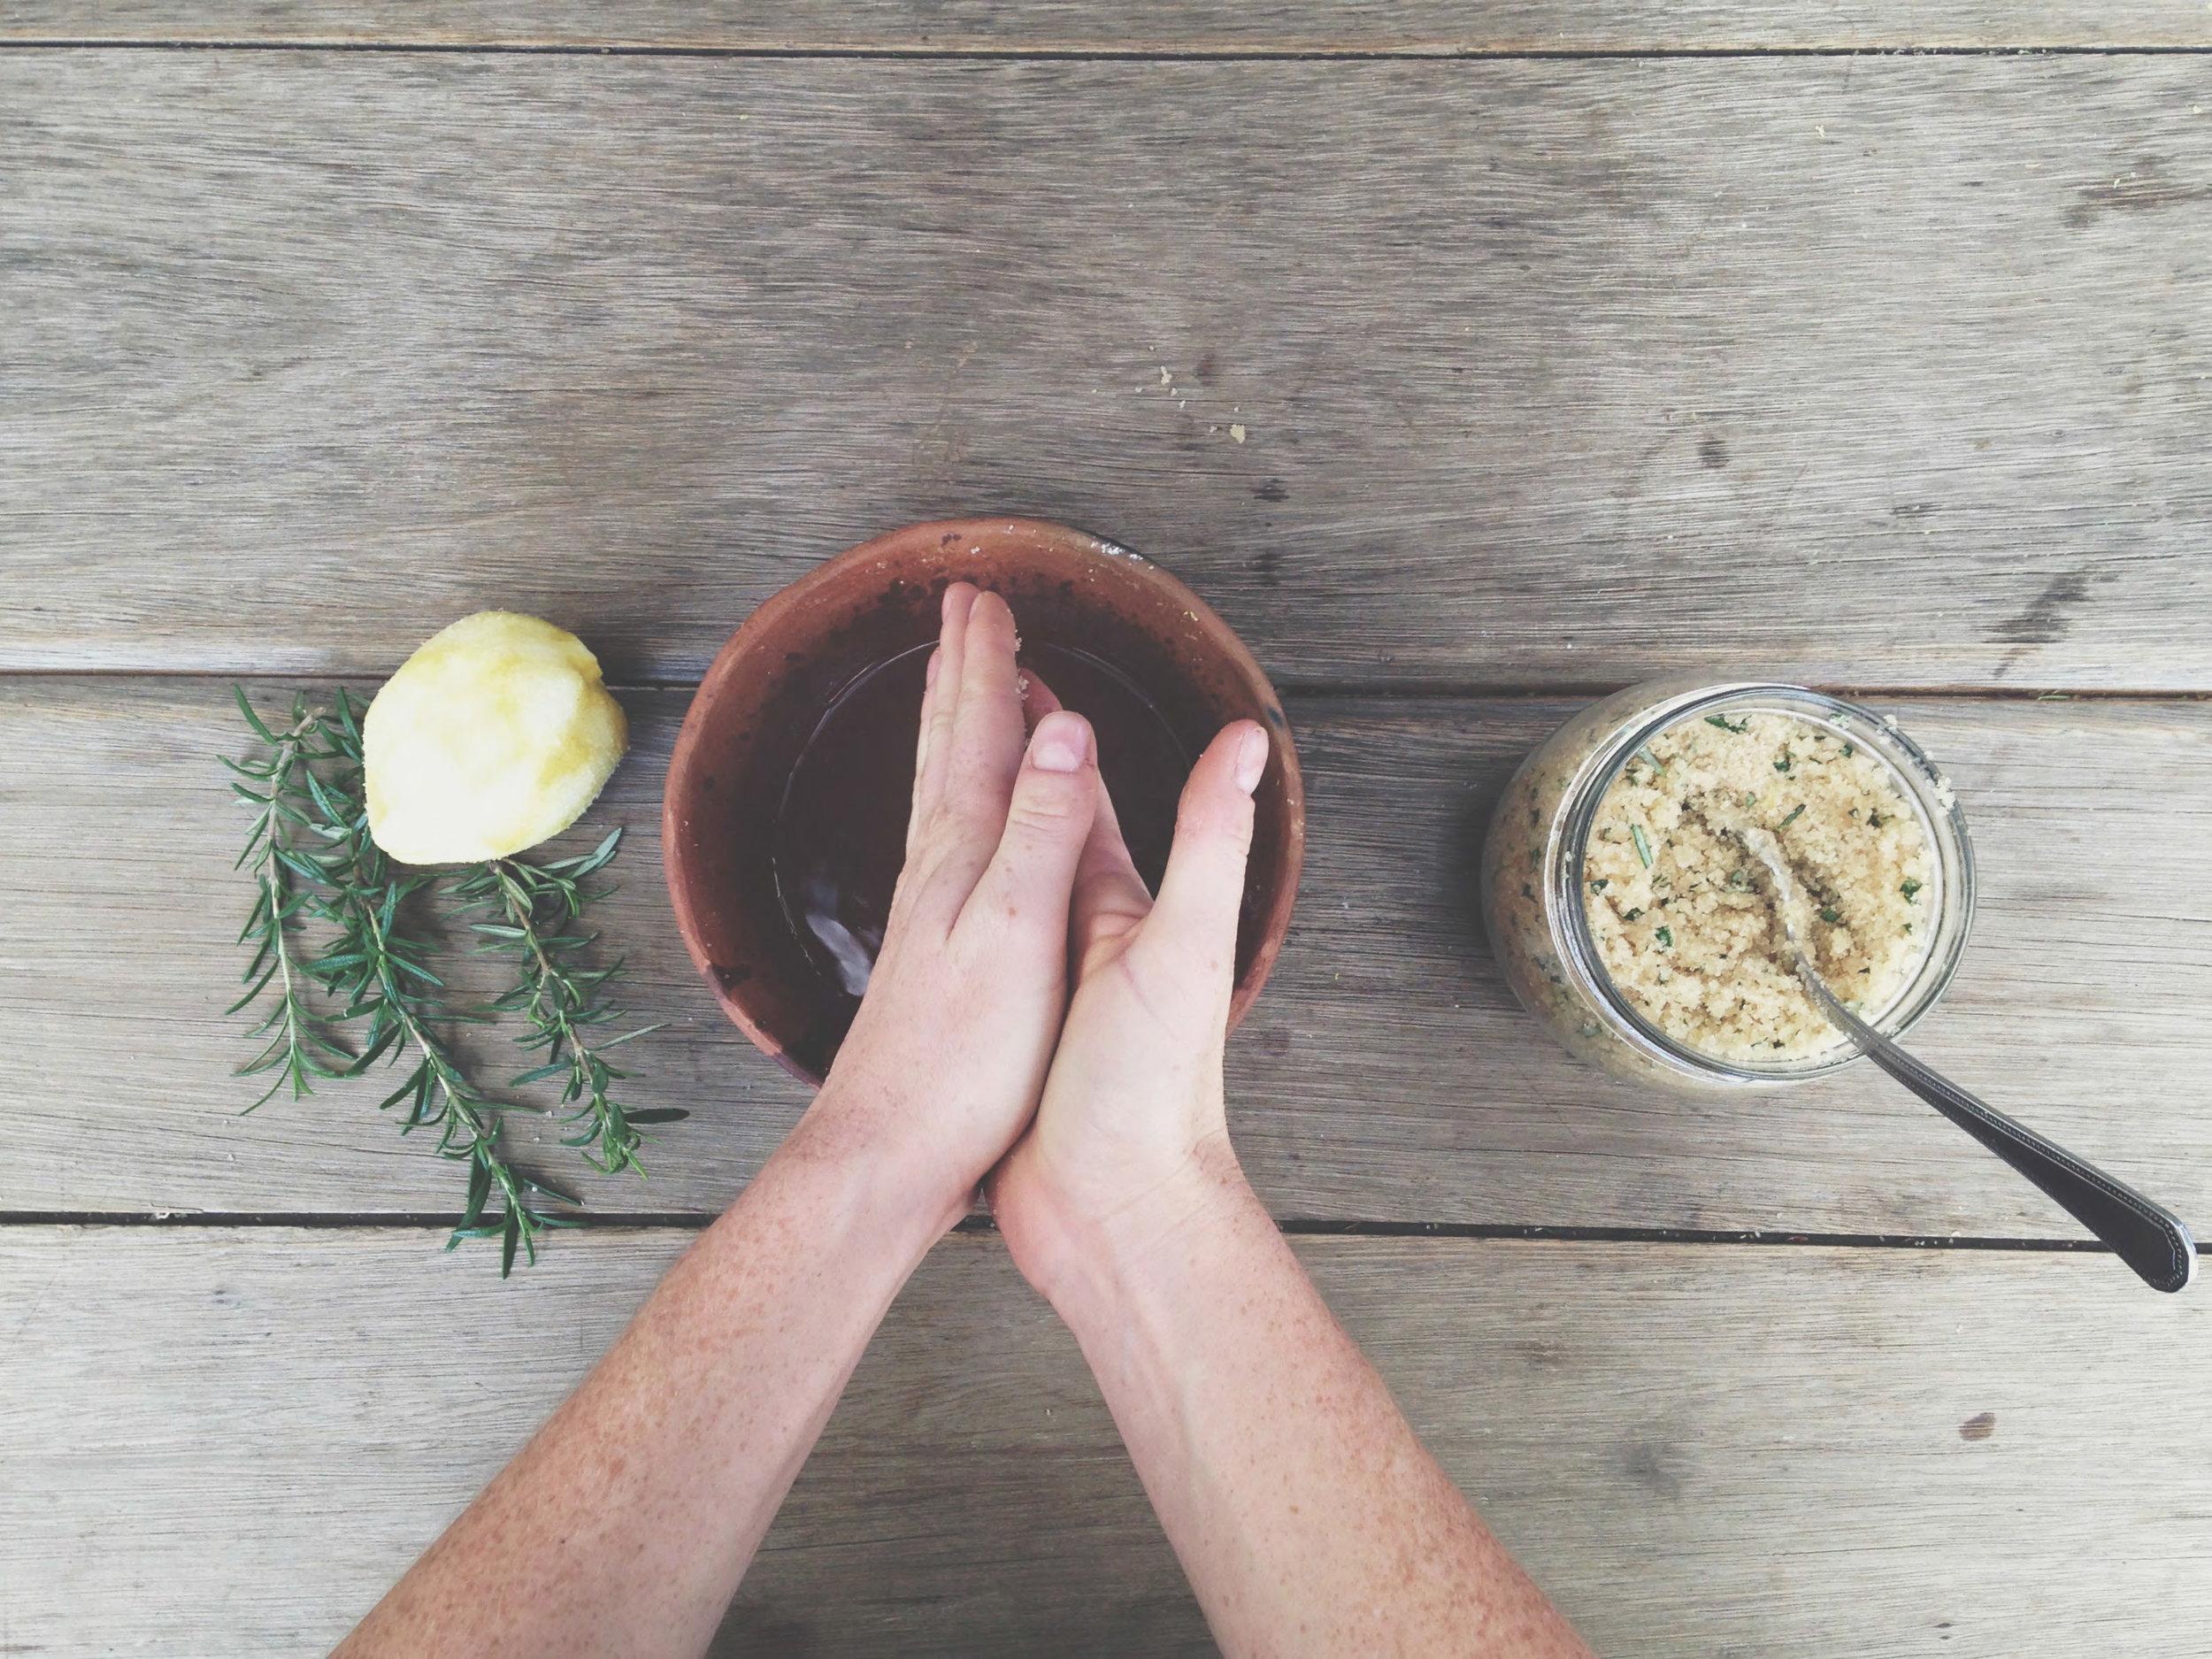 Rosemary and lemon body scrub recipe | Eco friendly living - The Foraged Life